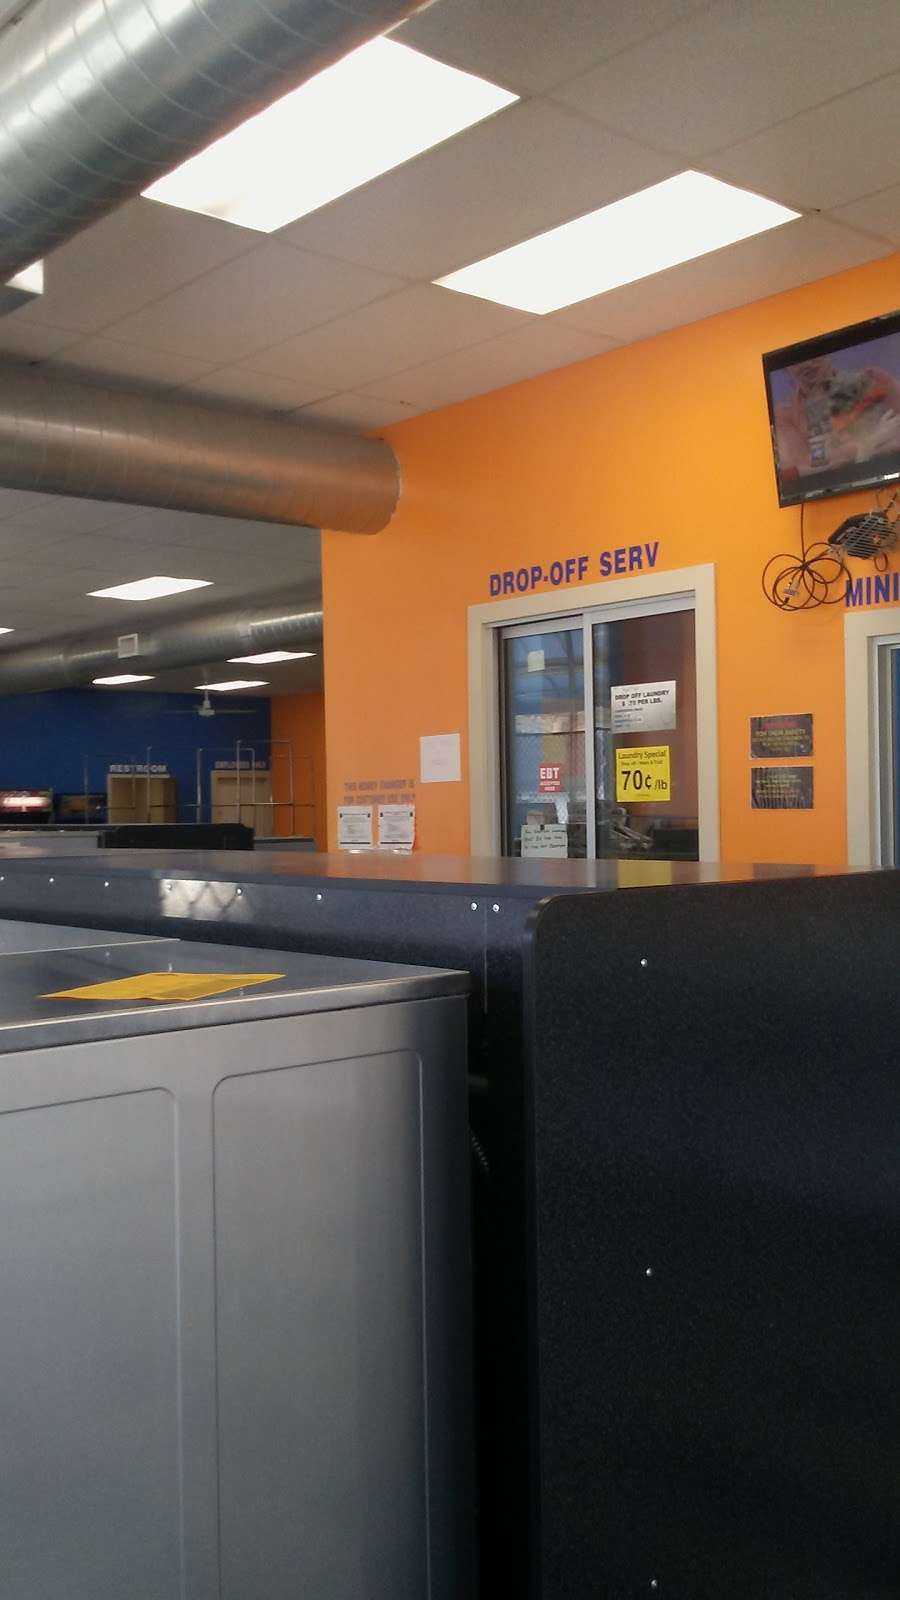 Truman Wash Tub - laundry  | Photo 8 of 10 | Address: 10215 E Truman Rd, Independence, MO 64052, USA | Phone: (816) 503-8593